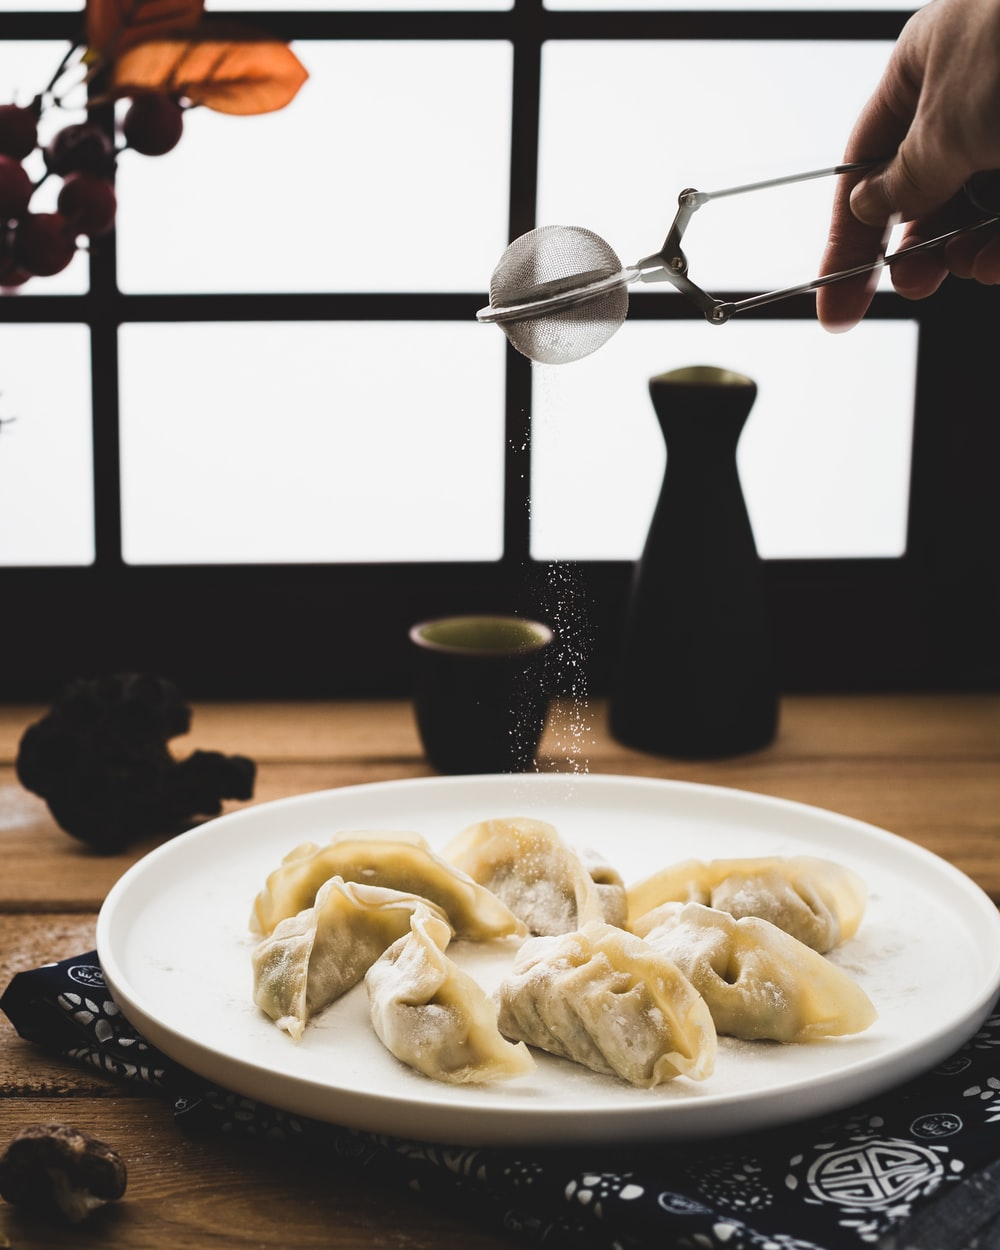 plate of dumplings on wooden surface